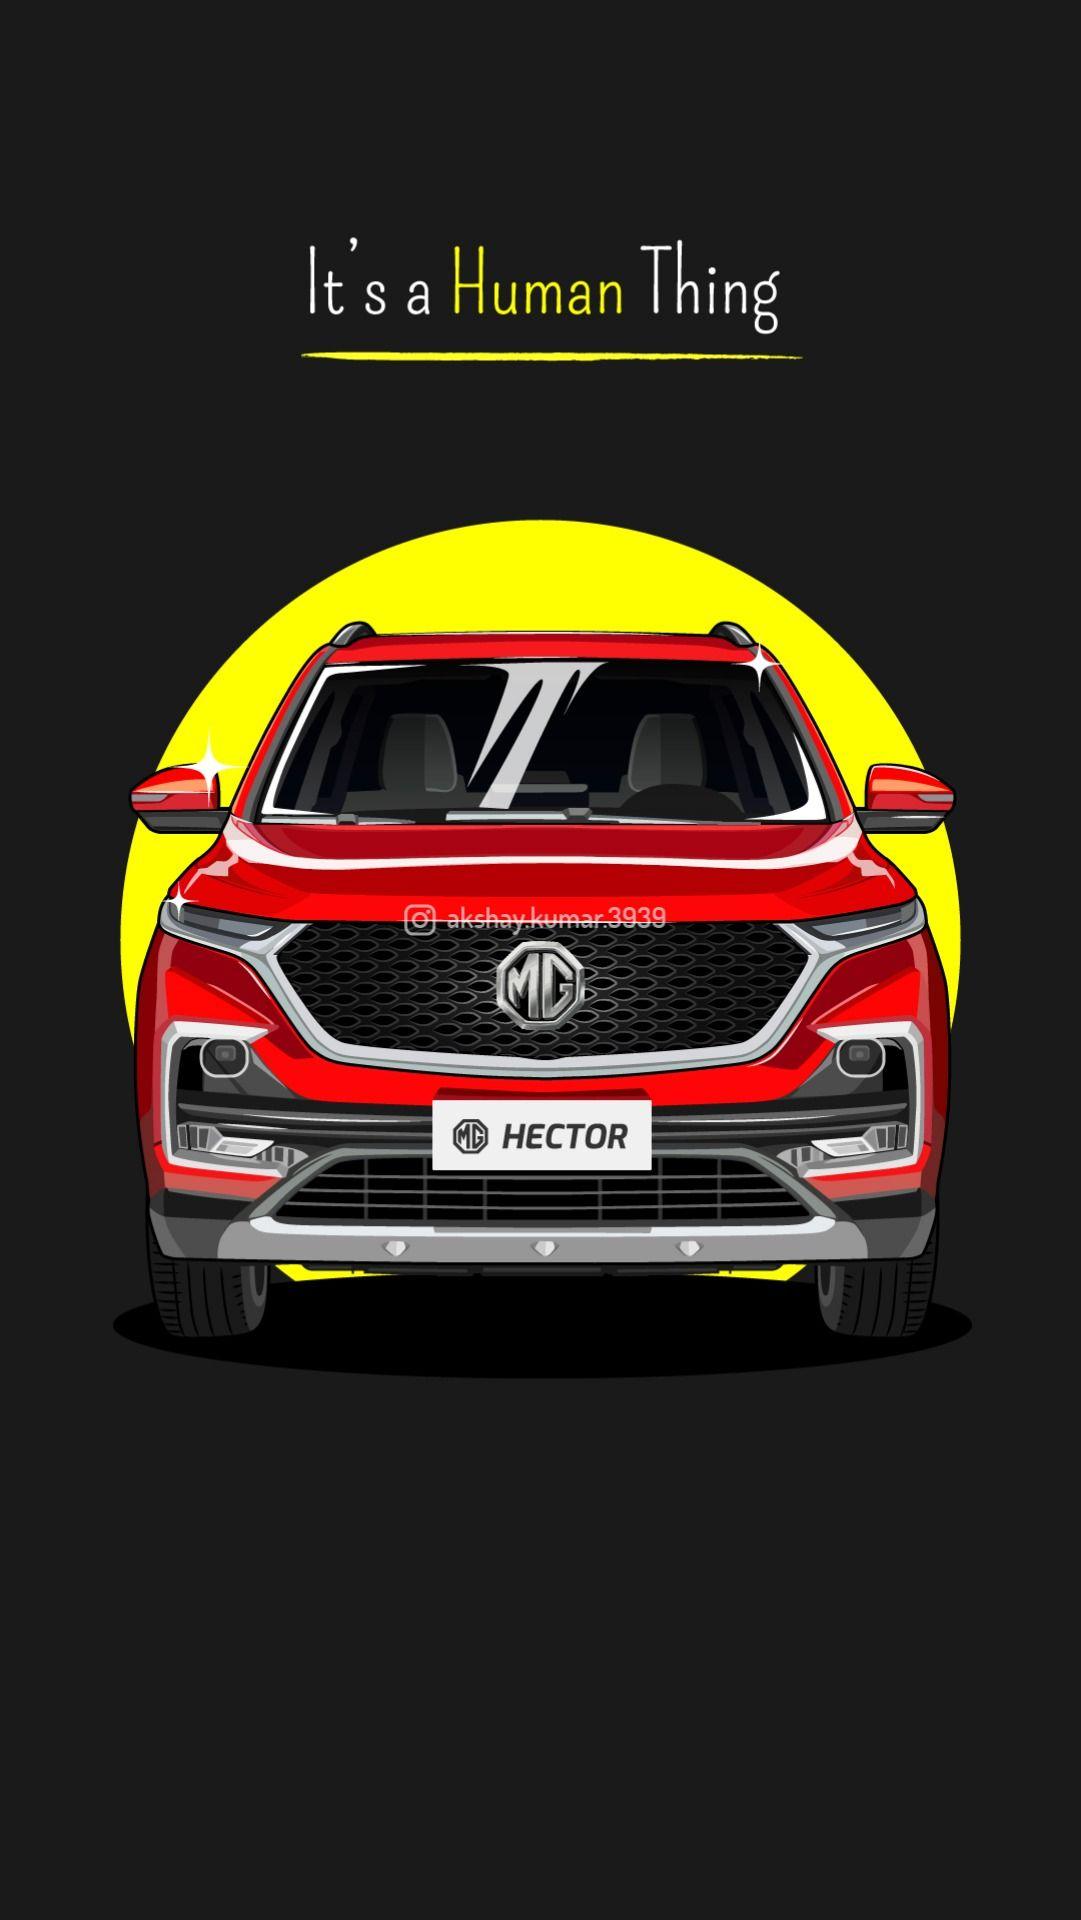 Mg Hector Wallpaper Indian Cars Wallpaper Vector Art Hector Car Vector Vector Artwork